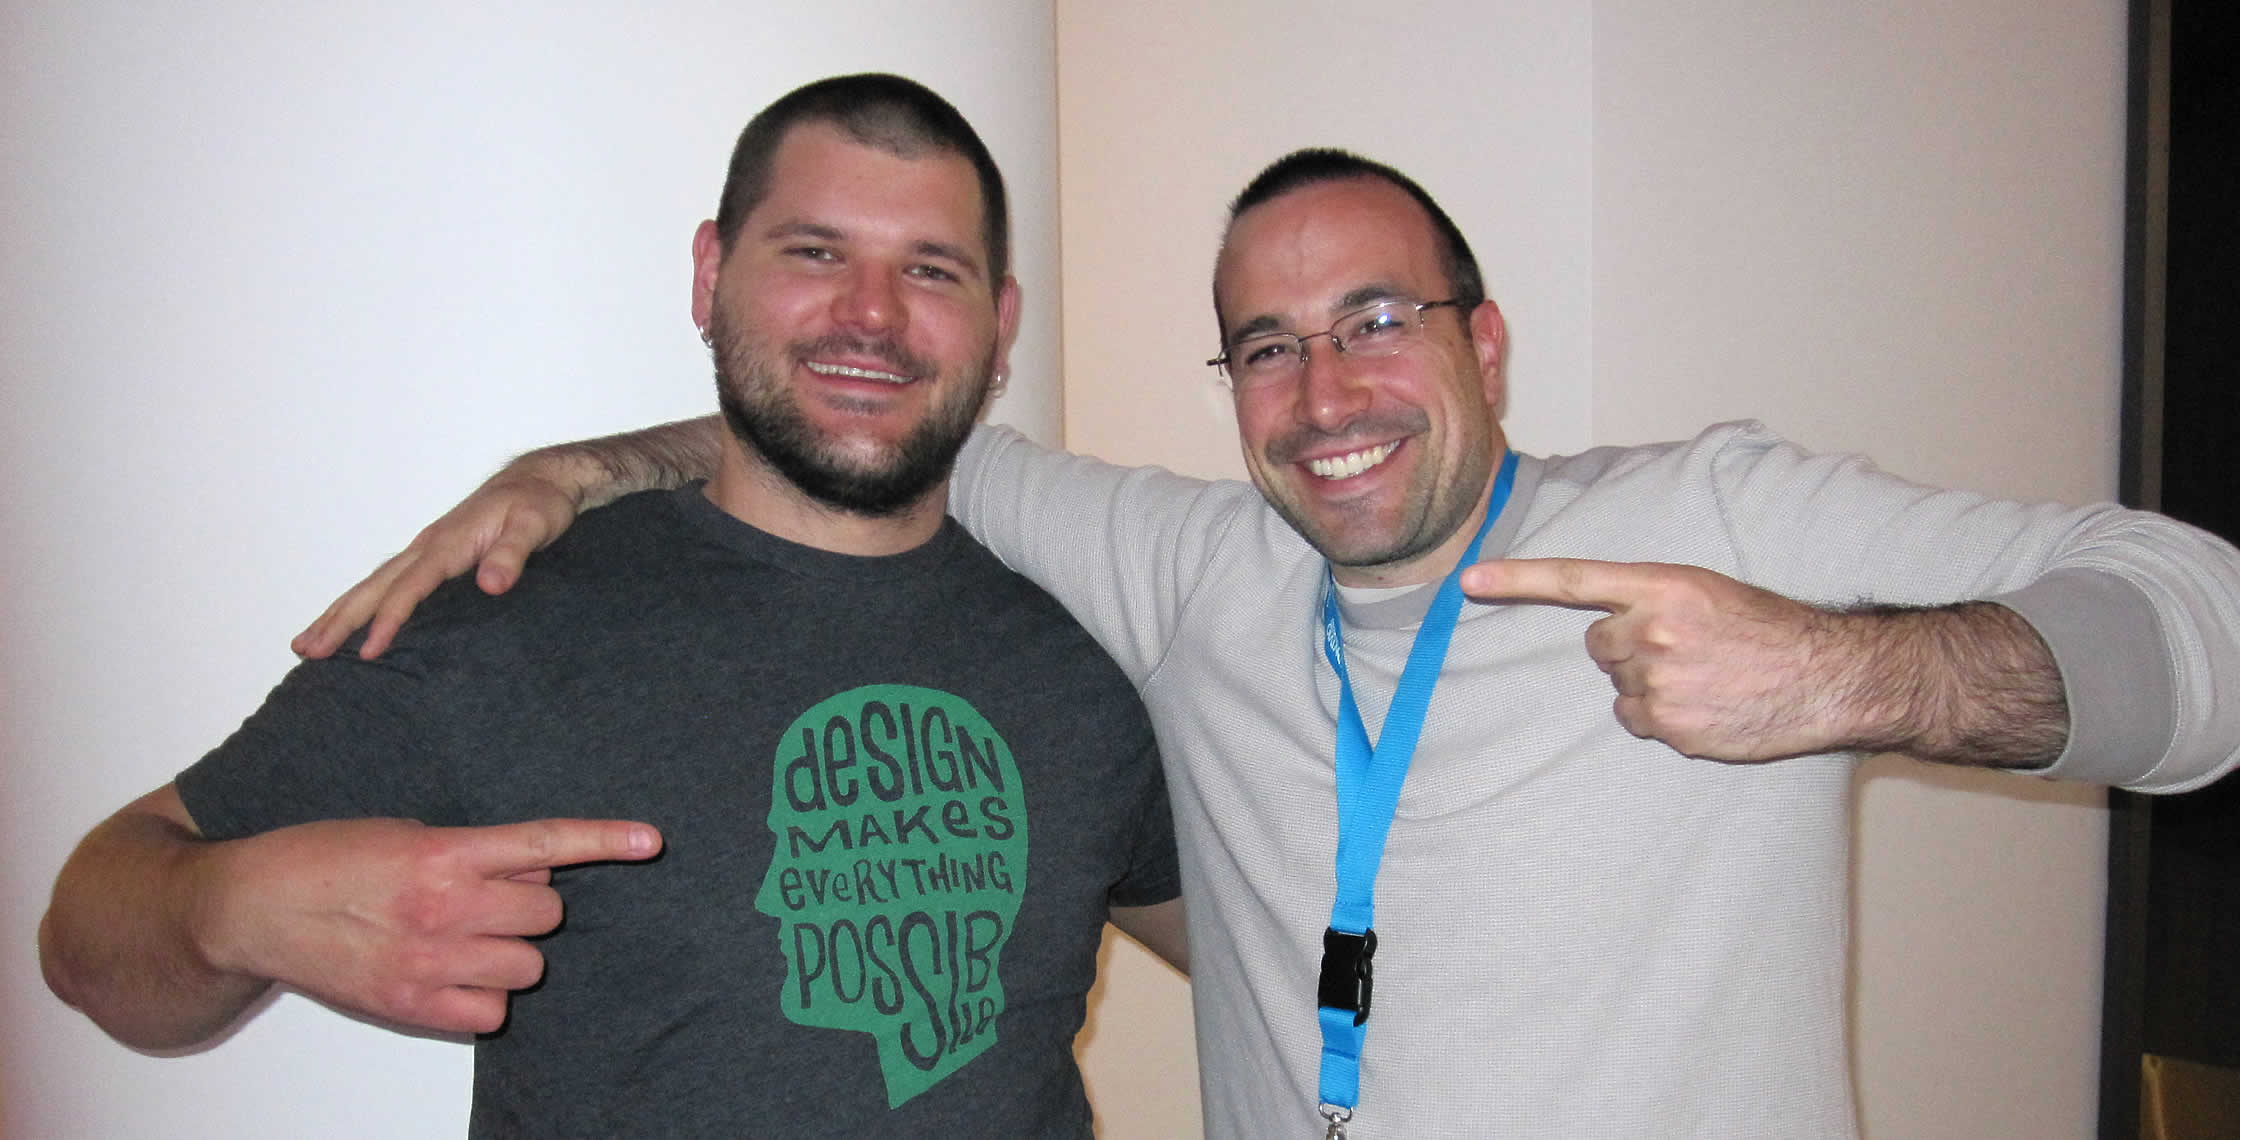 Ben Nadel at cf.Objective() 2013 (Bloomington, MN) with: Josh Siok